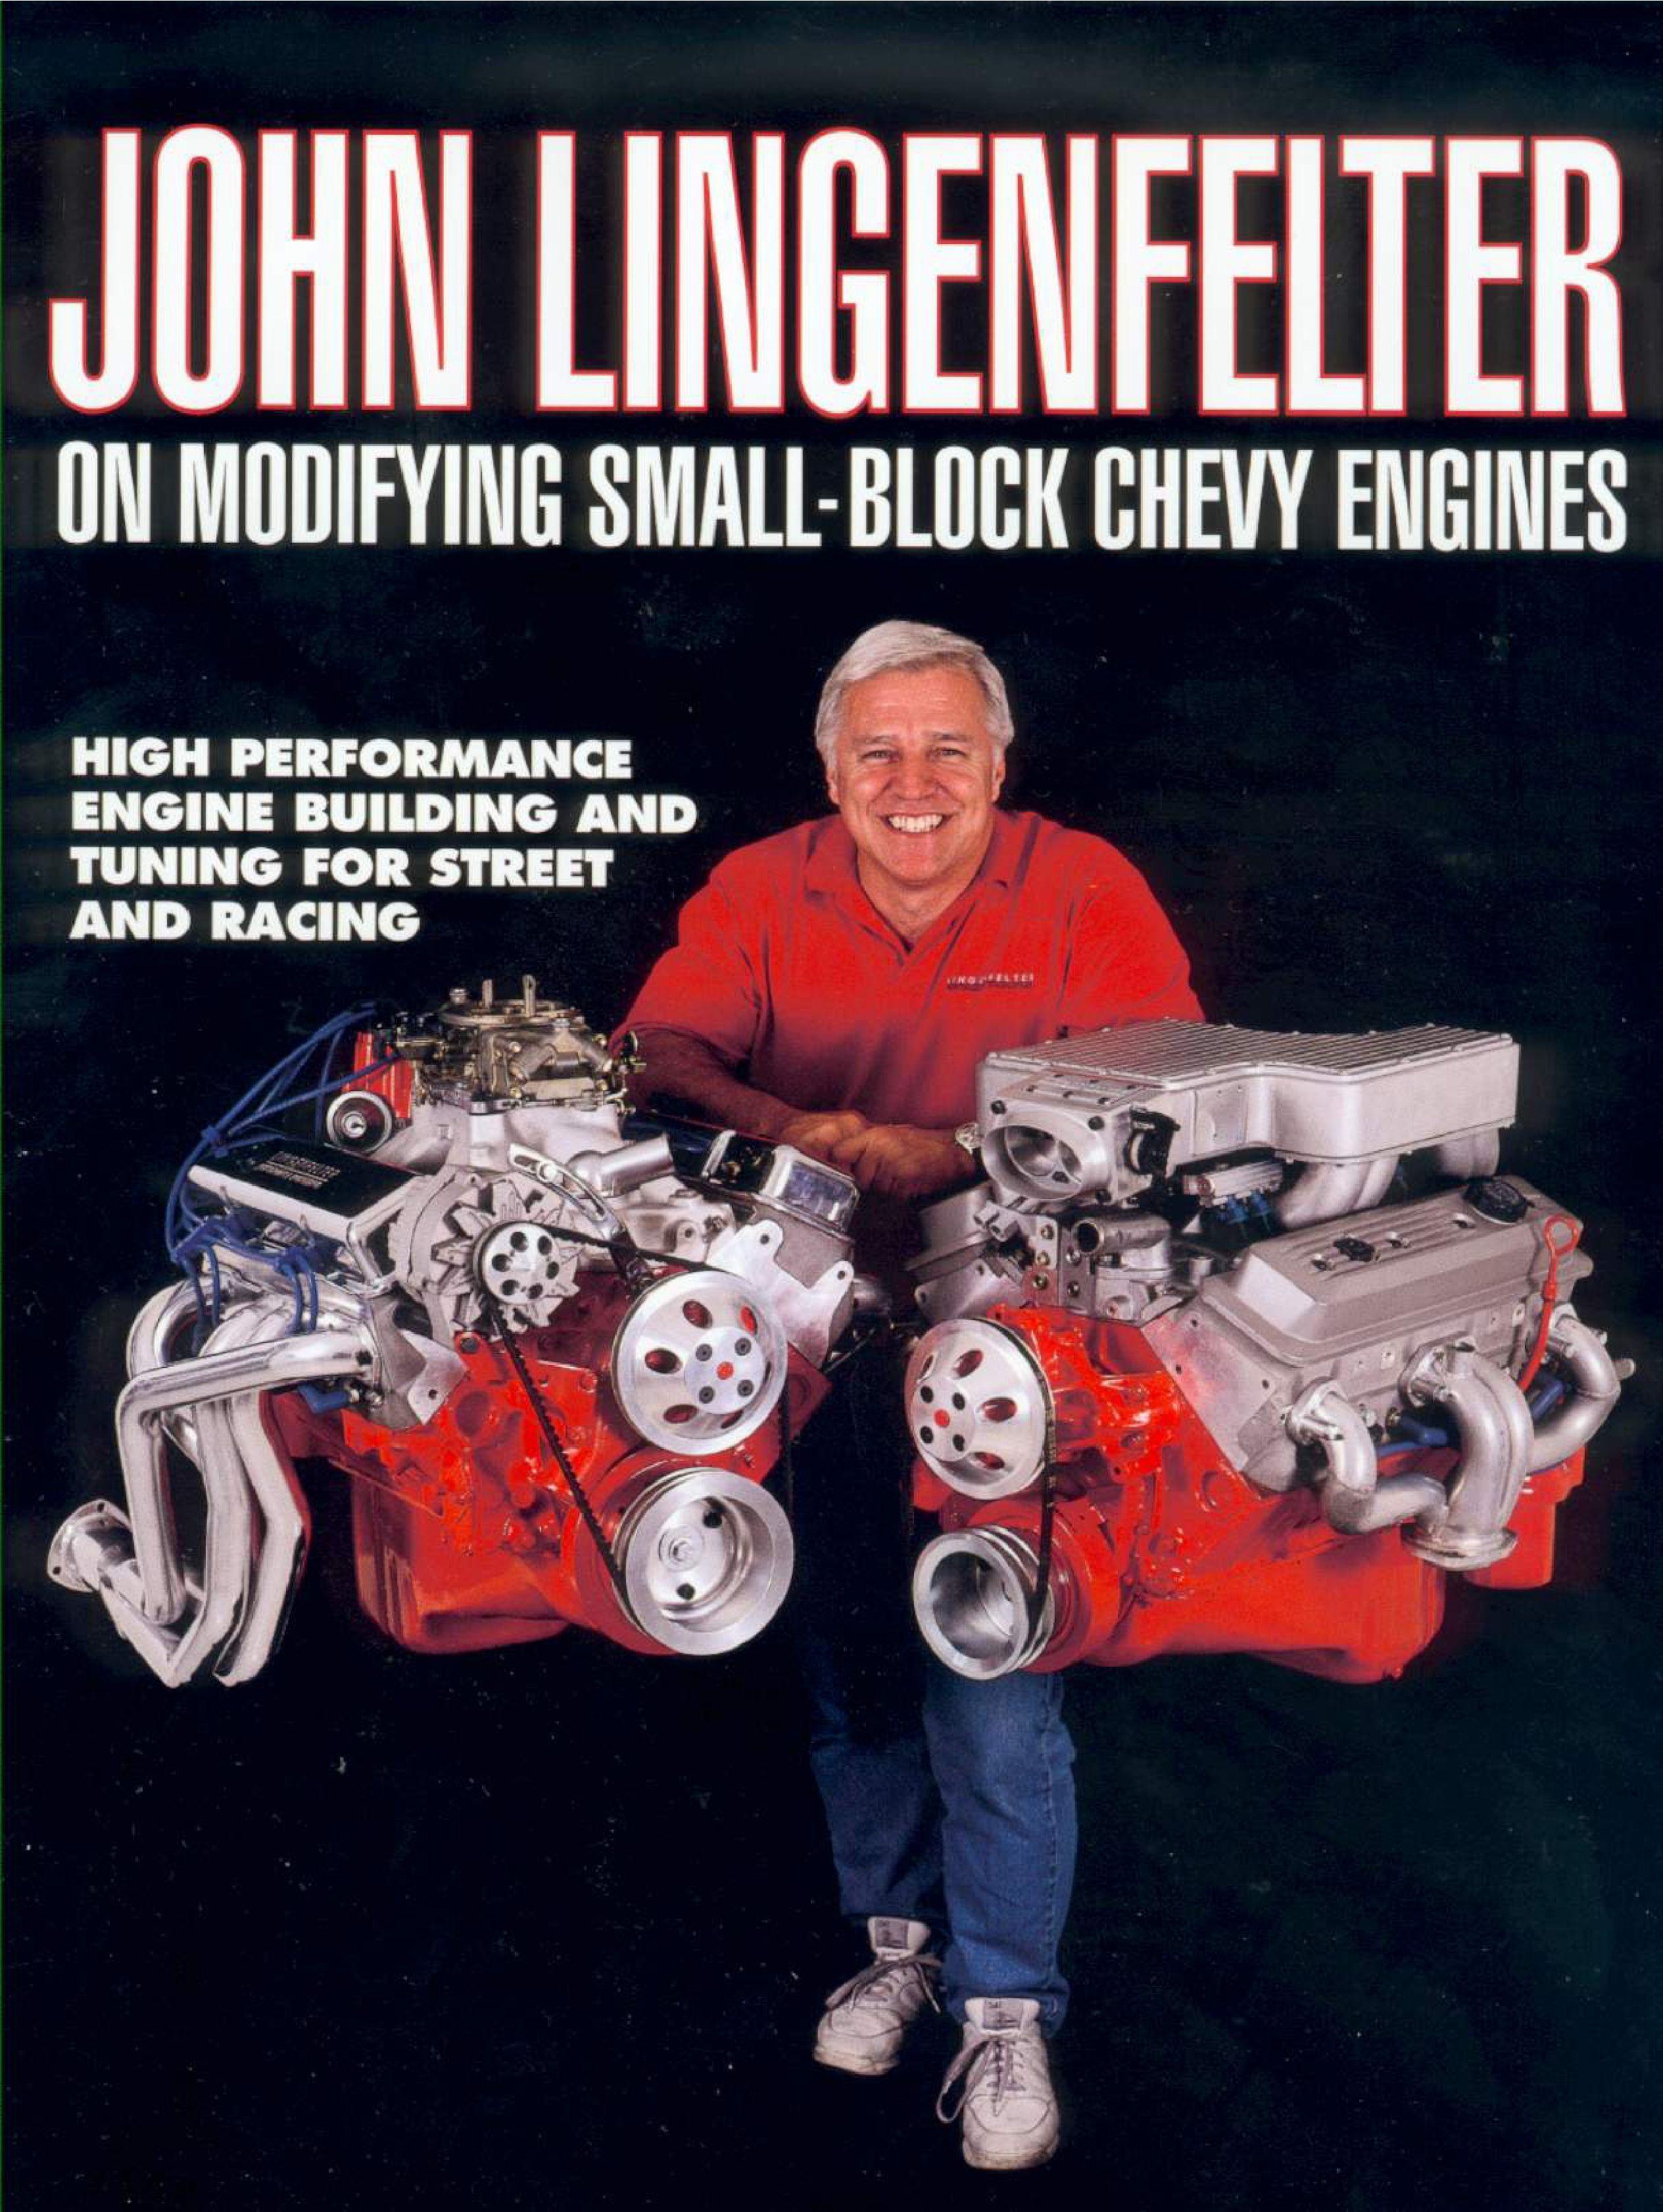 Modyfying Small Block Chevy Engines John Lingenfelter Pdf Download Service Manual Repair Manual Pdf Download Repair Manuals Chevy Repair And Maintenance